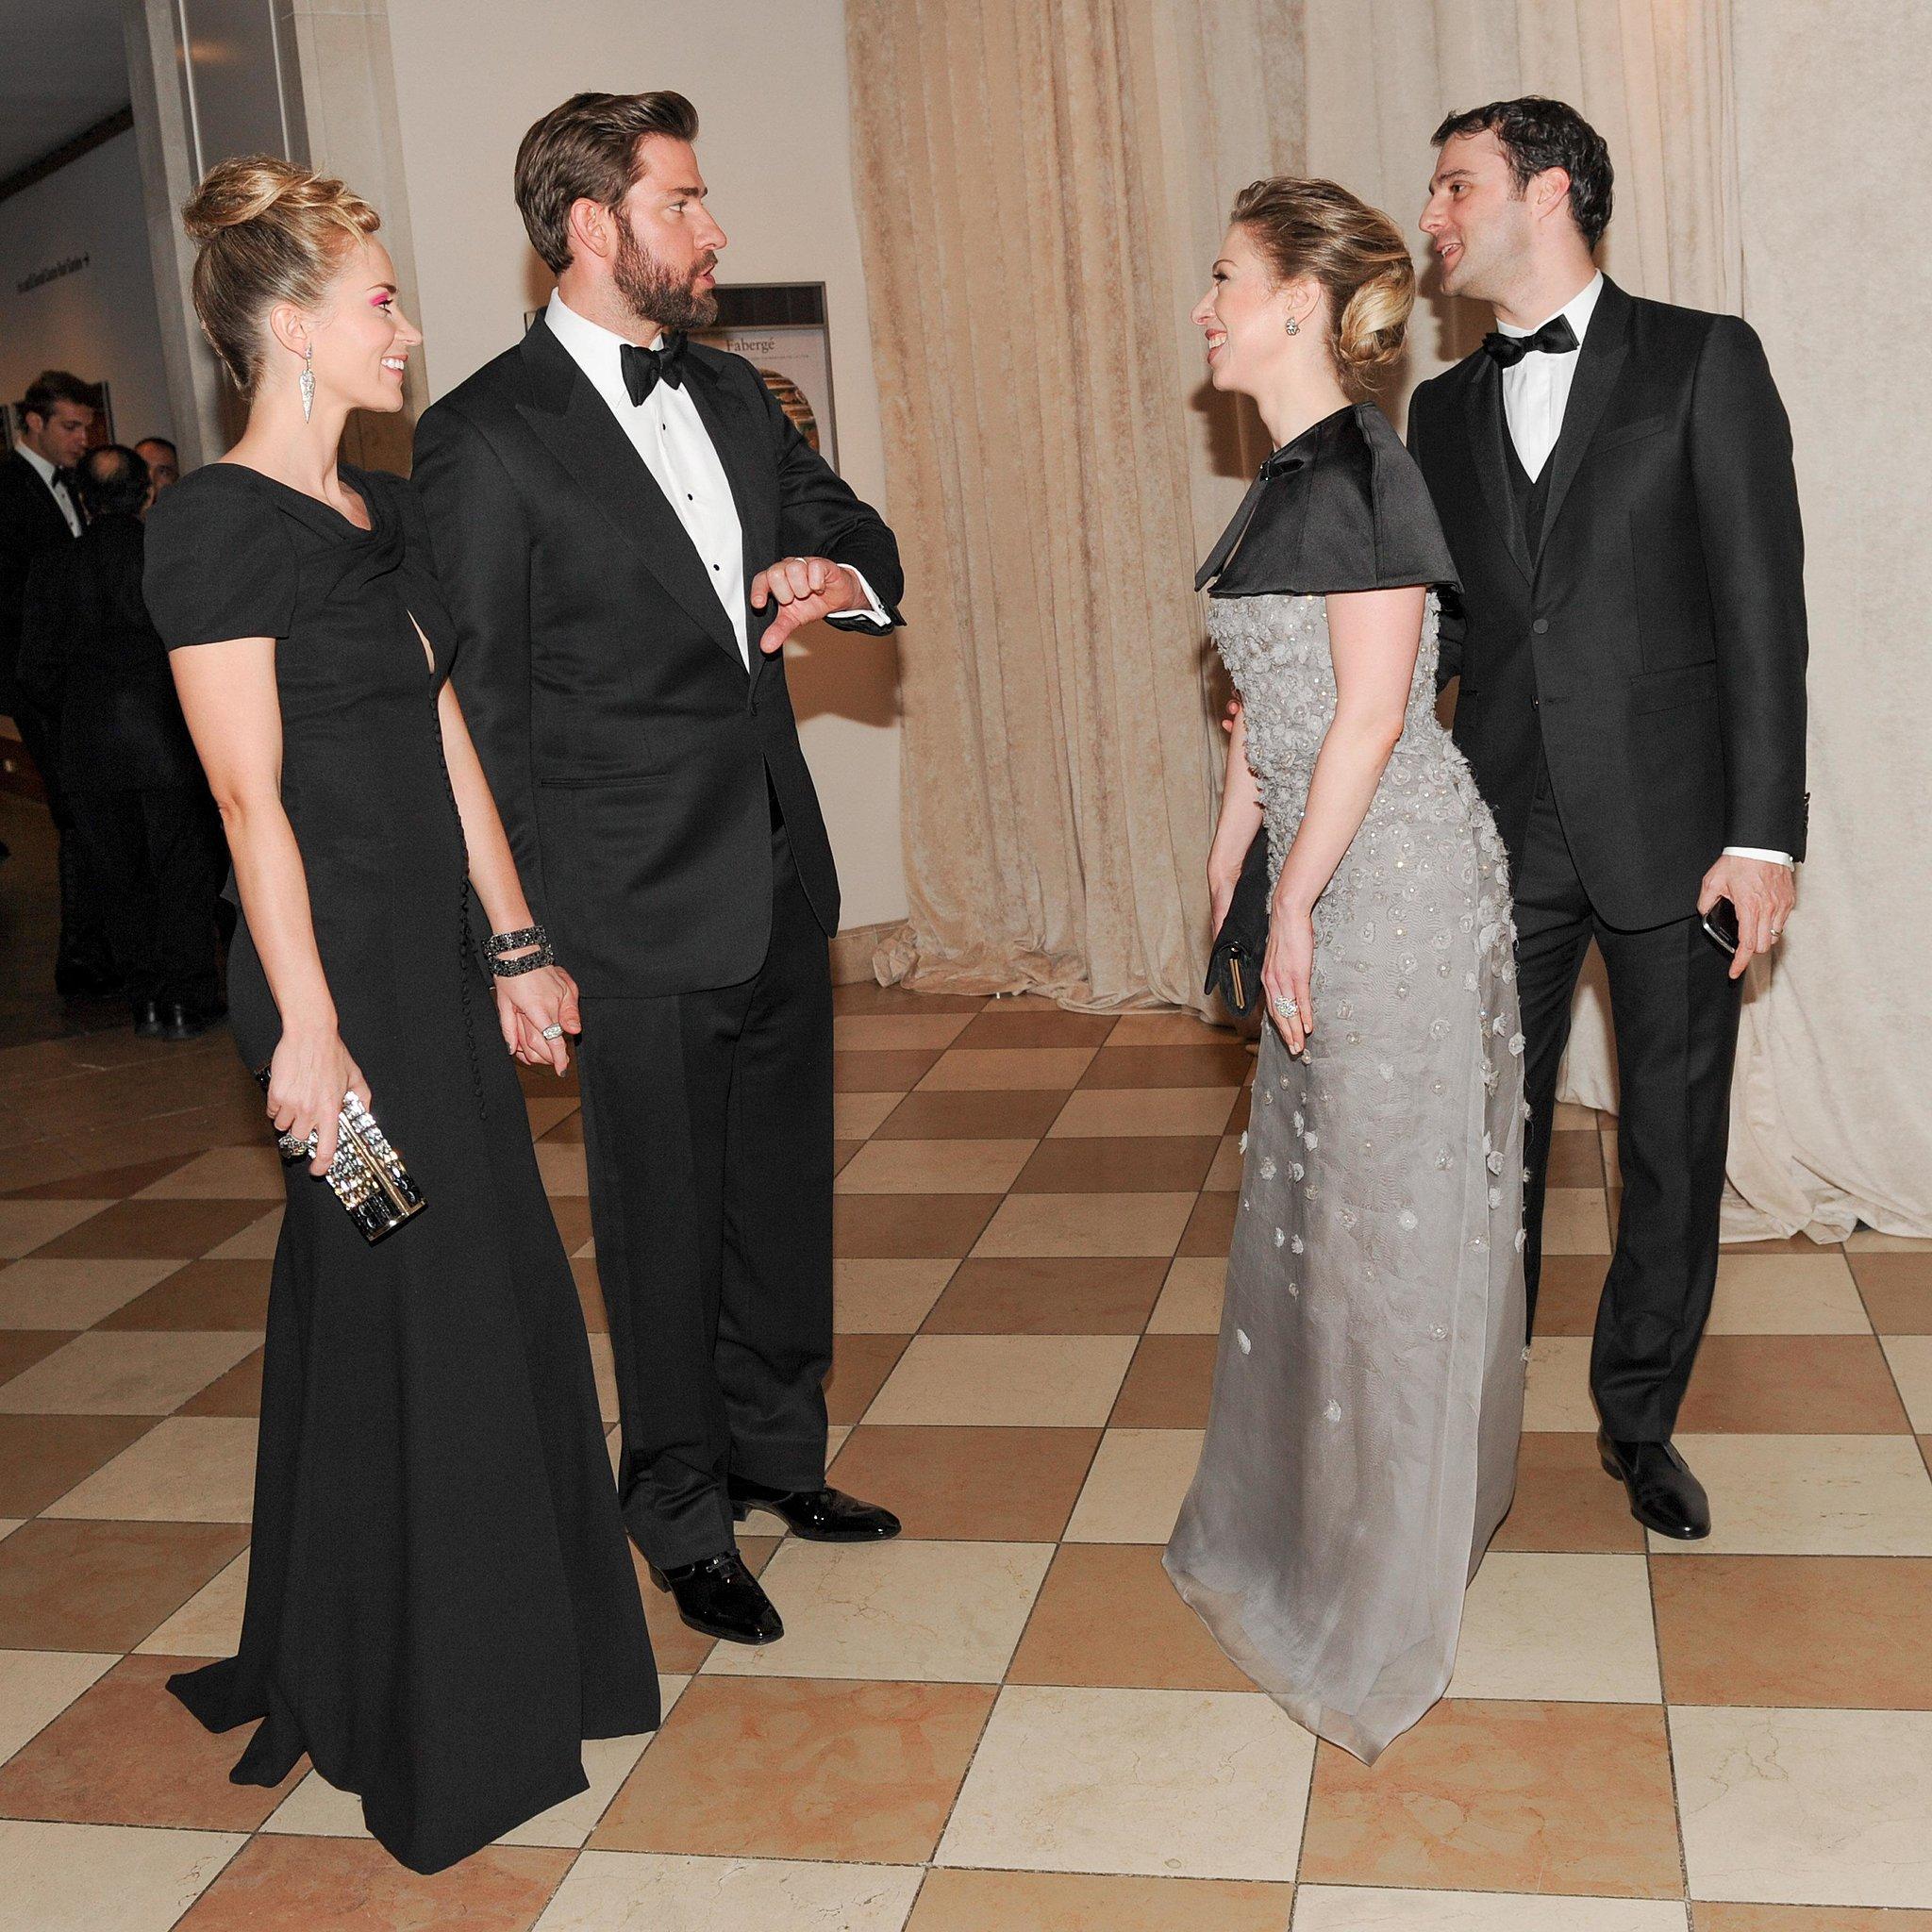 Emily Blunt and John Krasinski made small talk with Chelsea Clinton and Marc Mezvinsky. Source: Billy Farrell/BFANYC.com